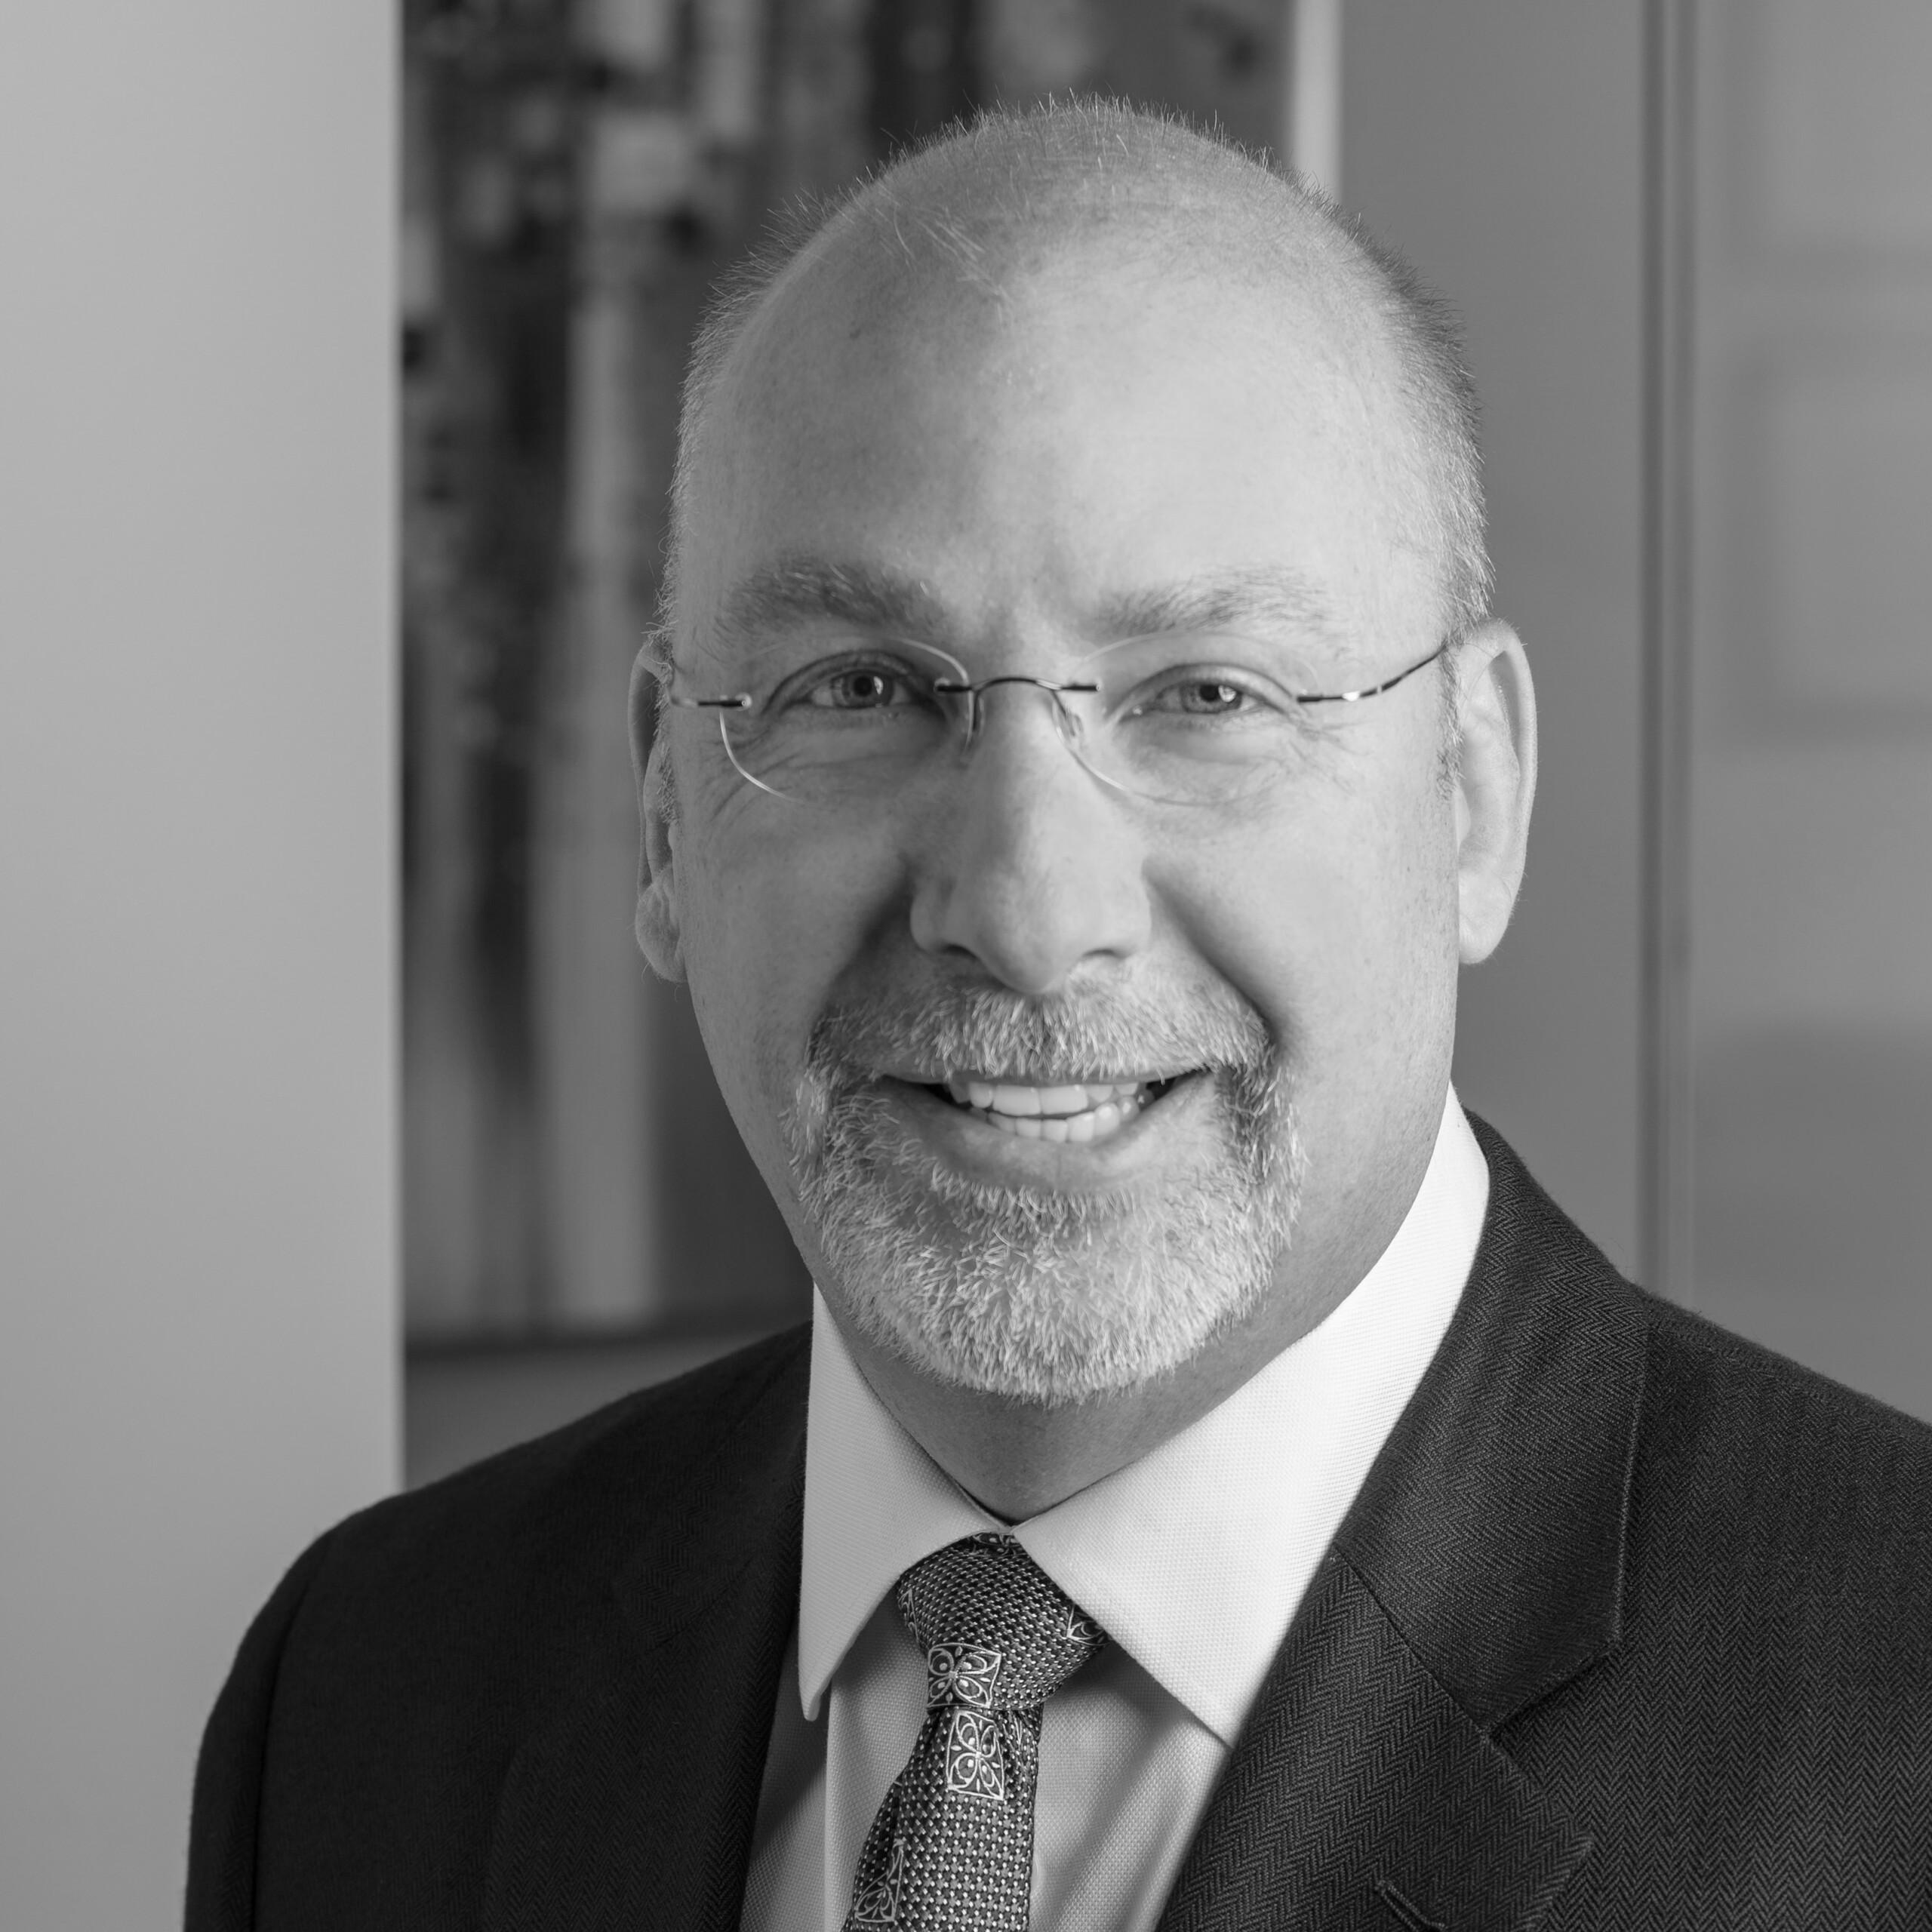 Dr. Martin Walsh